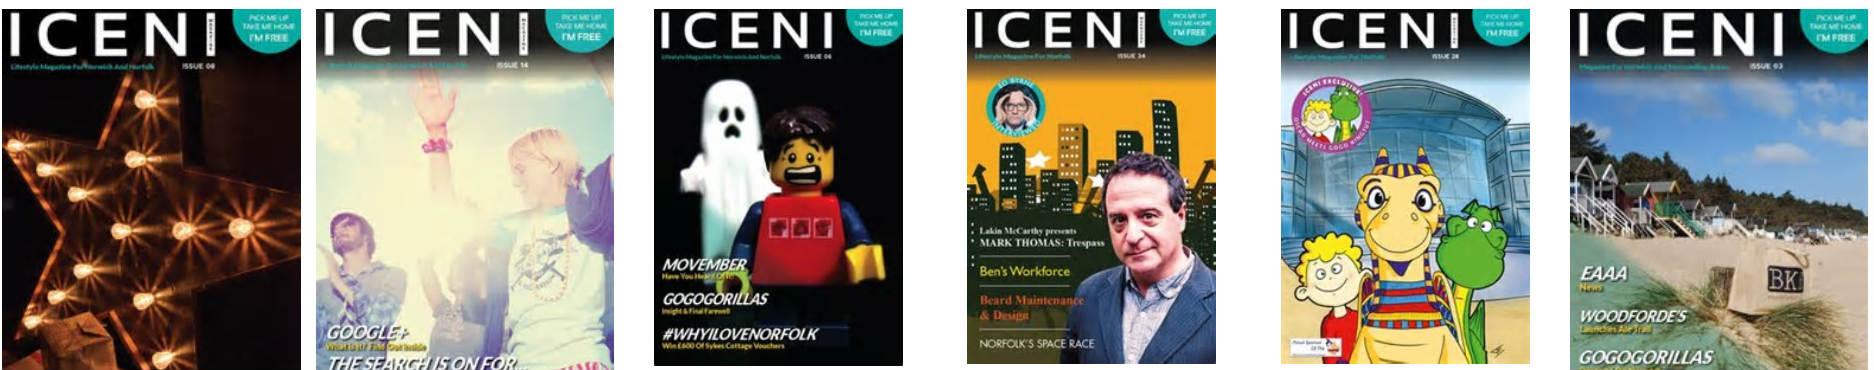 selection of Iceni Magazine covers